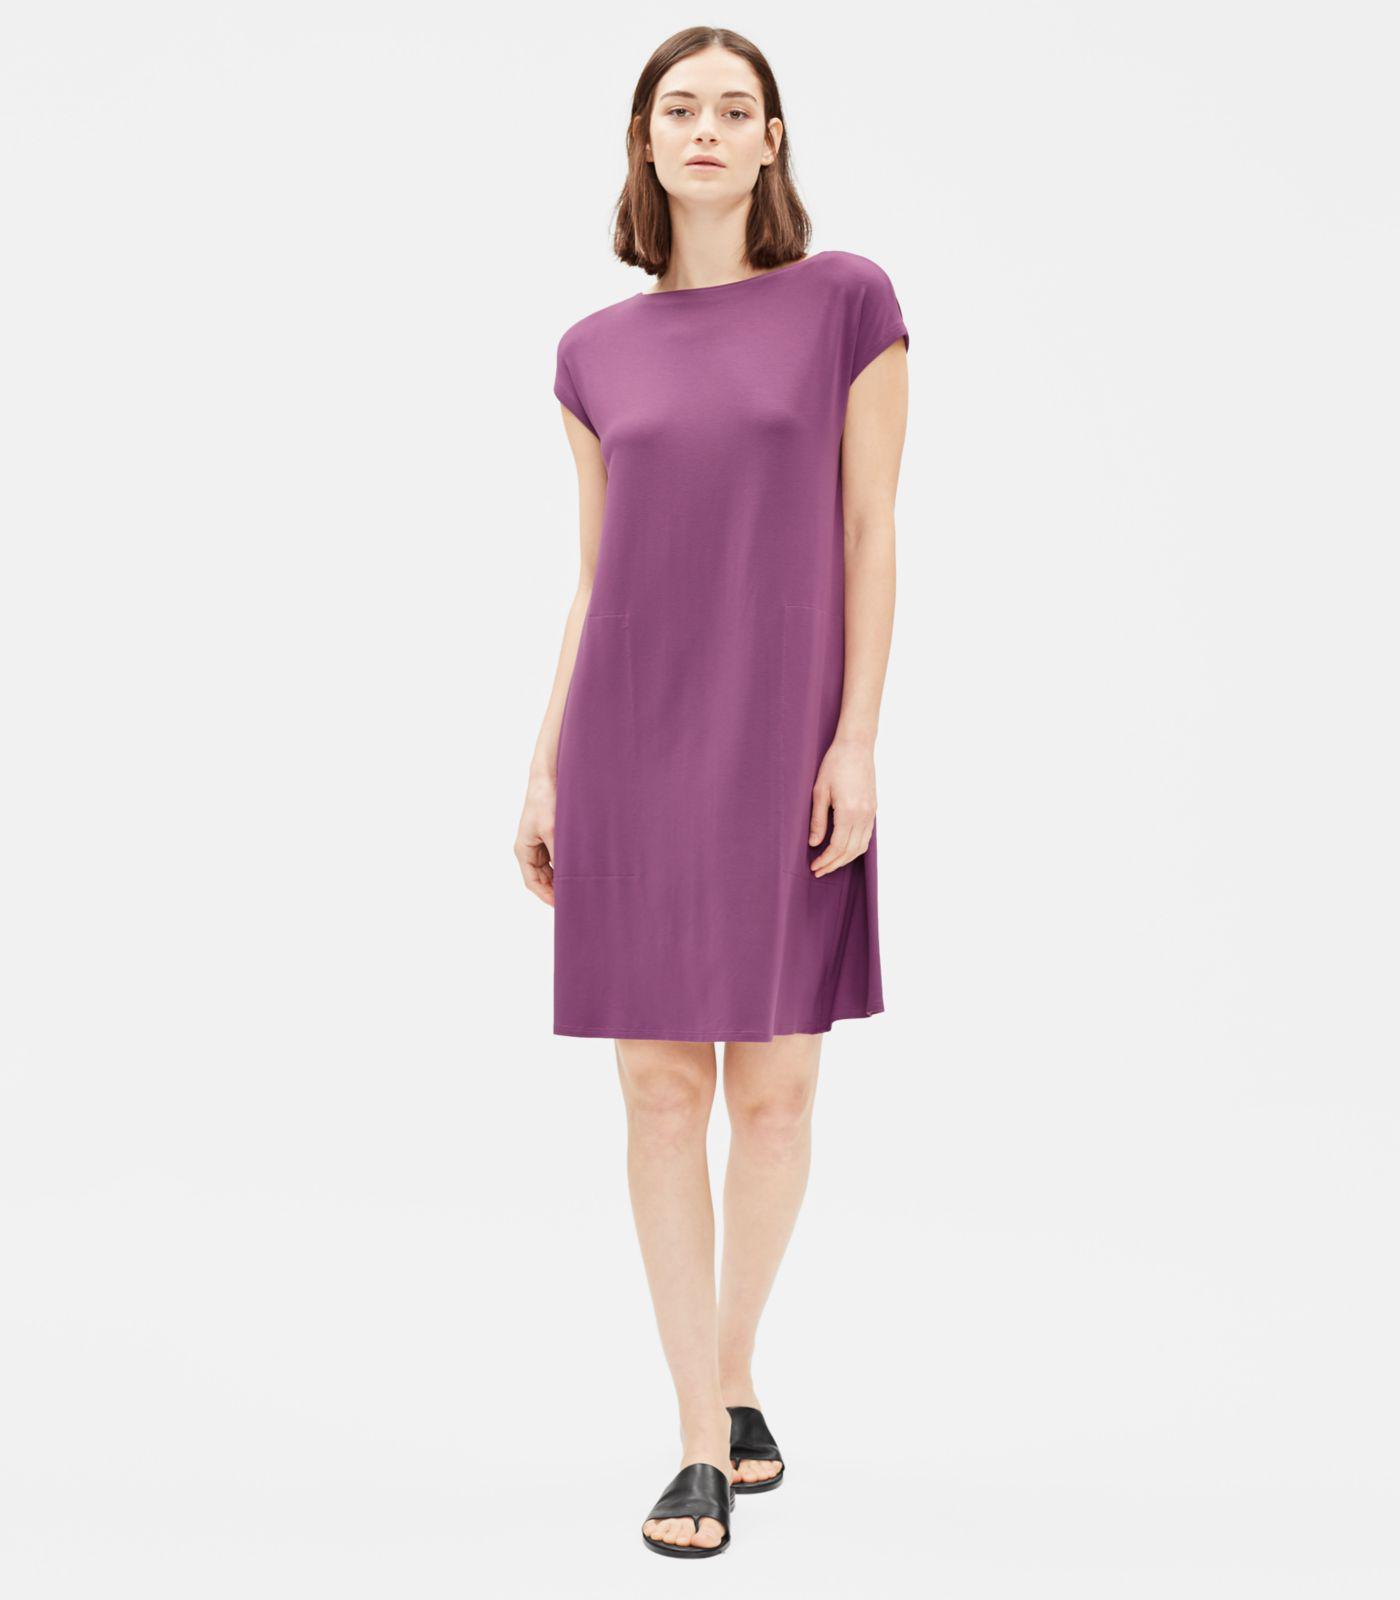 f0b3bf91edb5b9 Lyst - Eileen Fisher Viscose Jersey Dress With Back Twist in Purple